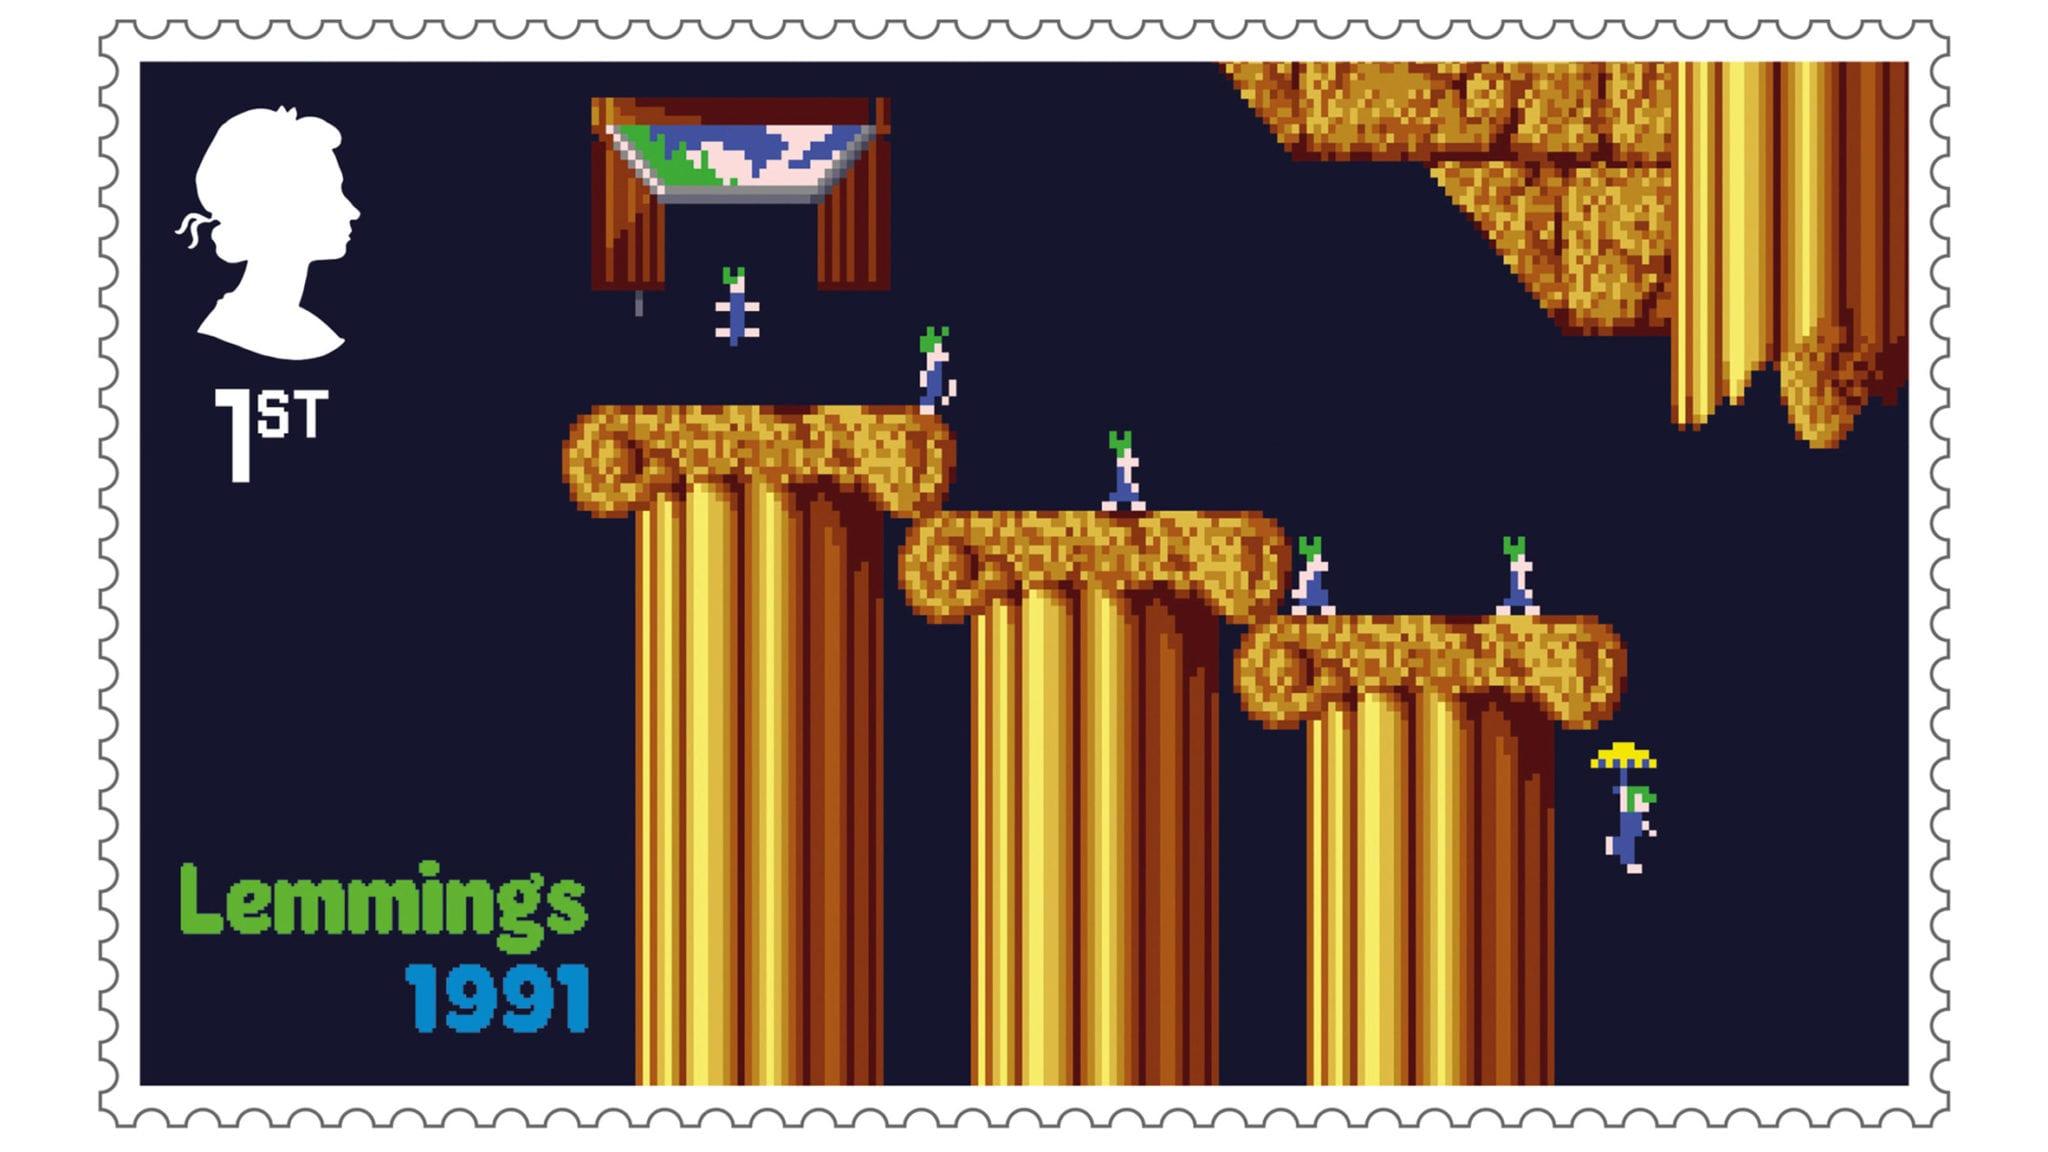 kráľovská pošta vzdáva hold ikonickým hrám 7 scaled - Kráľovská pošta vzdáva hold ikonickým hrám